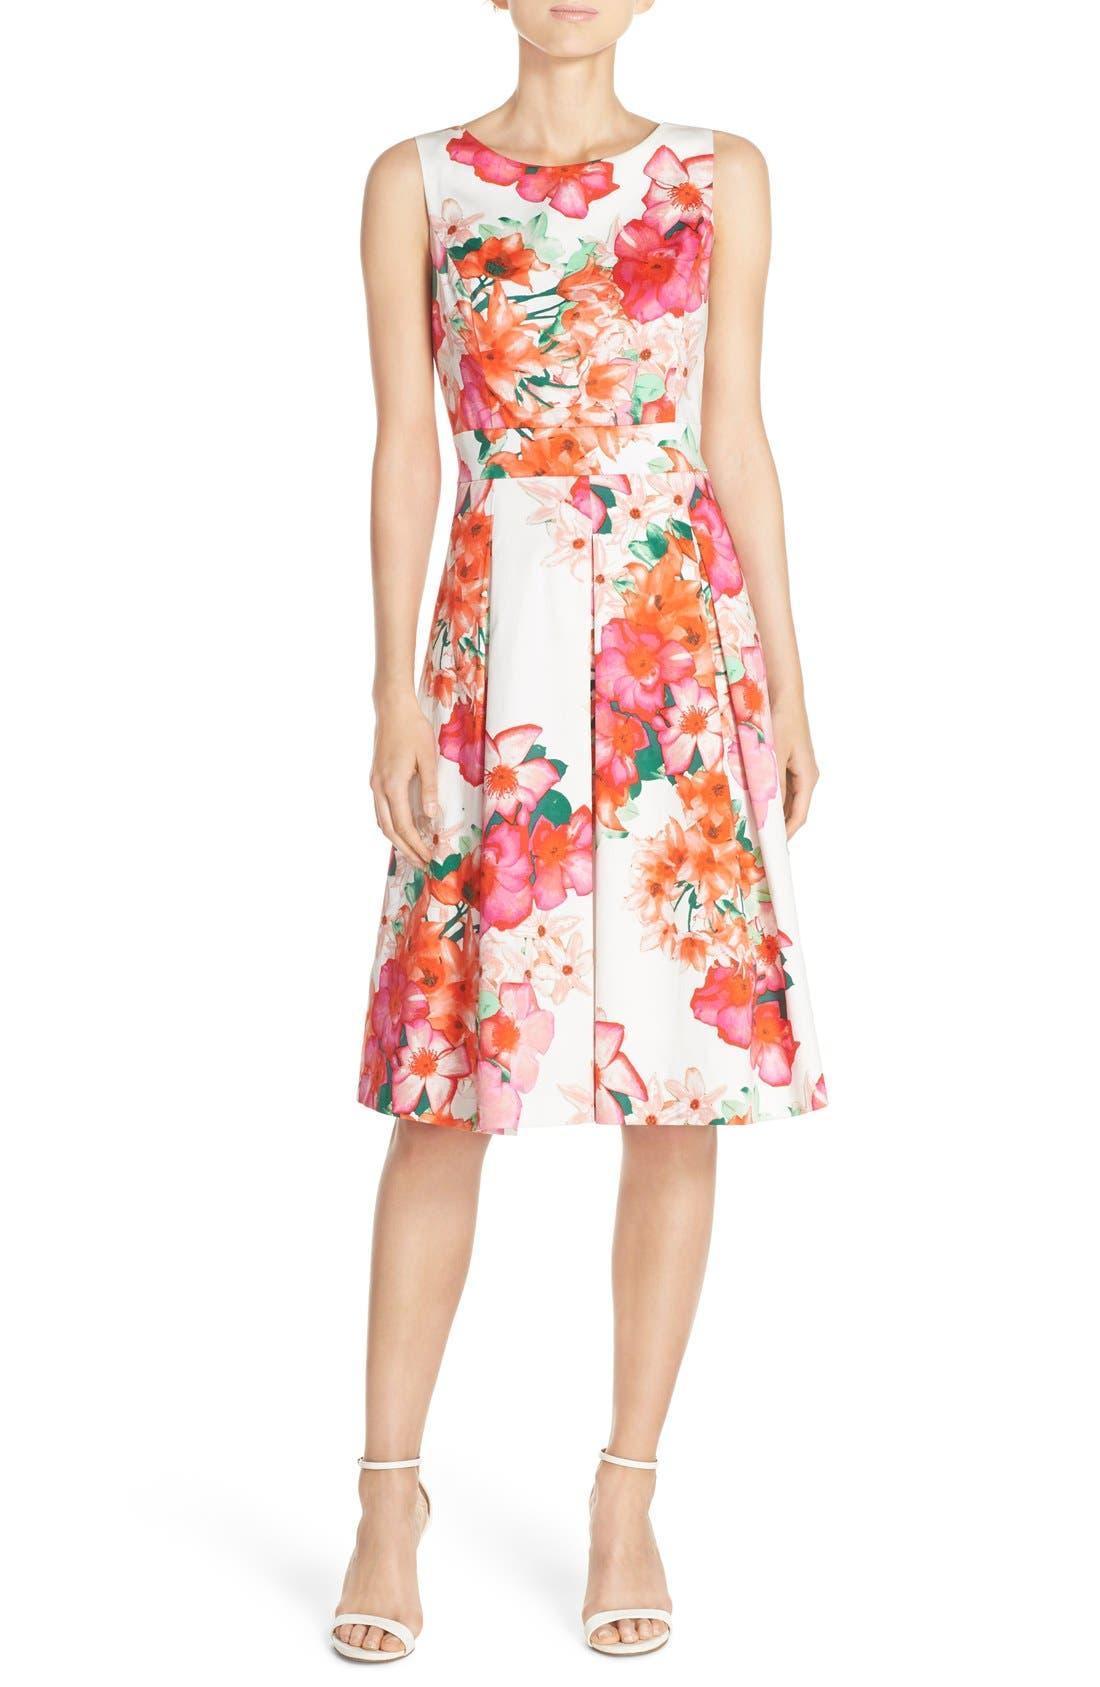 Alternate Image 1 Selected - Eliza J Floral Print Fit & Flare Dress (Regular & Petite)